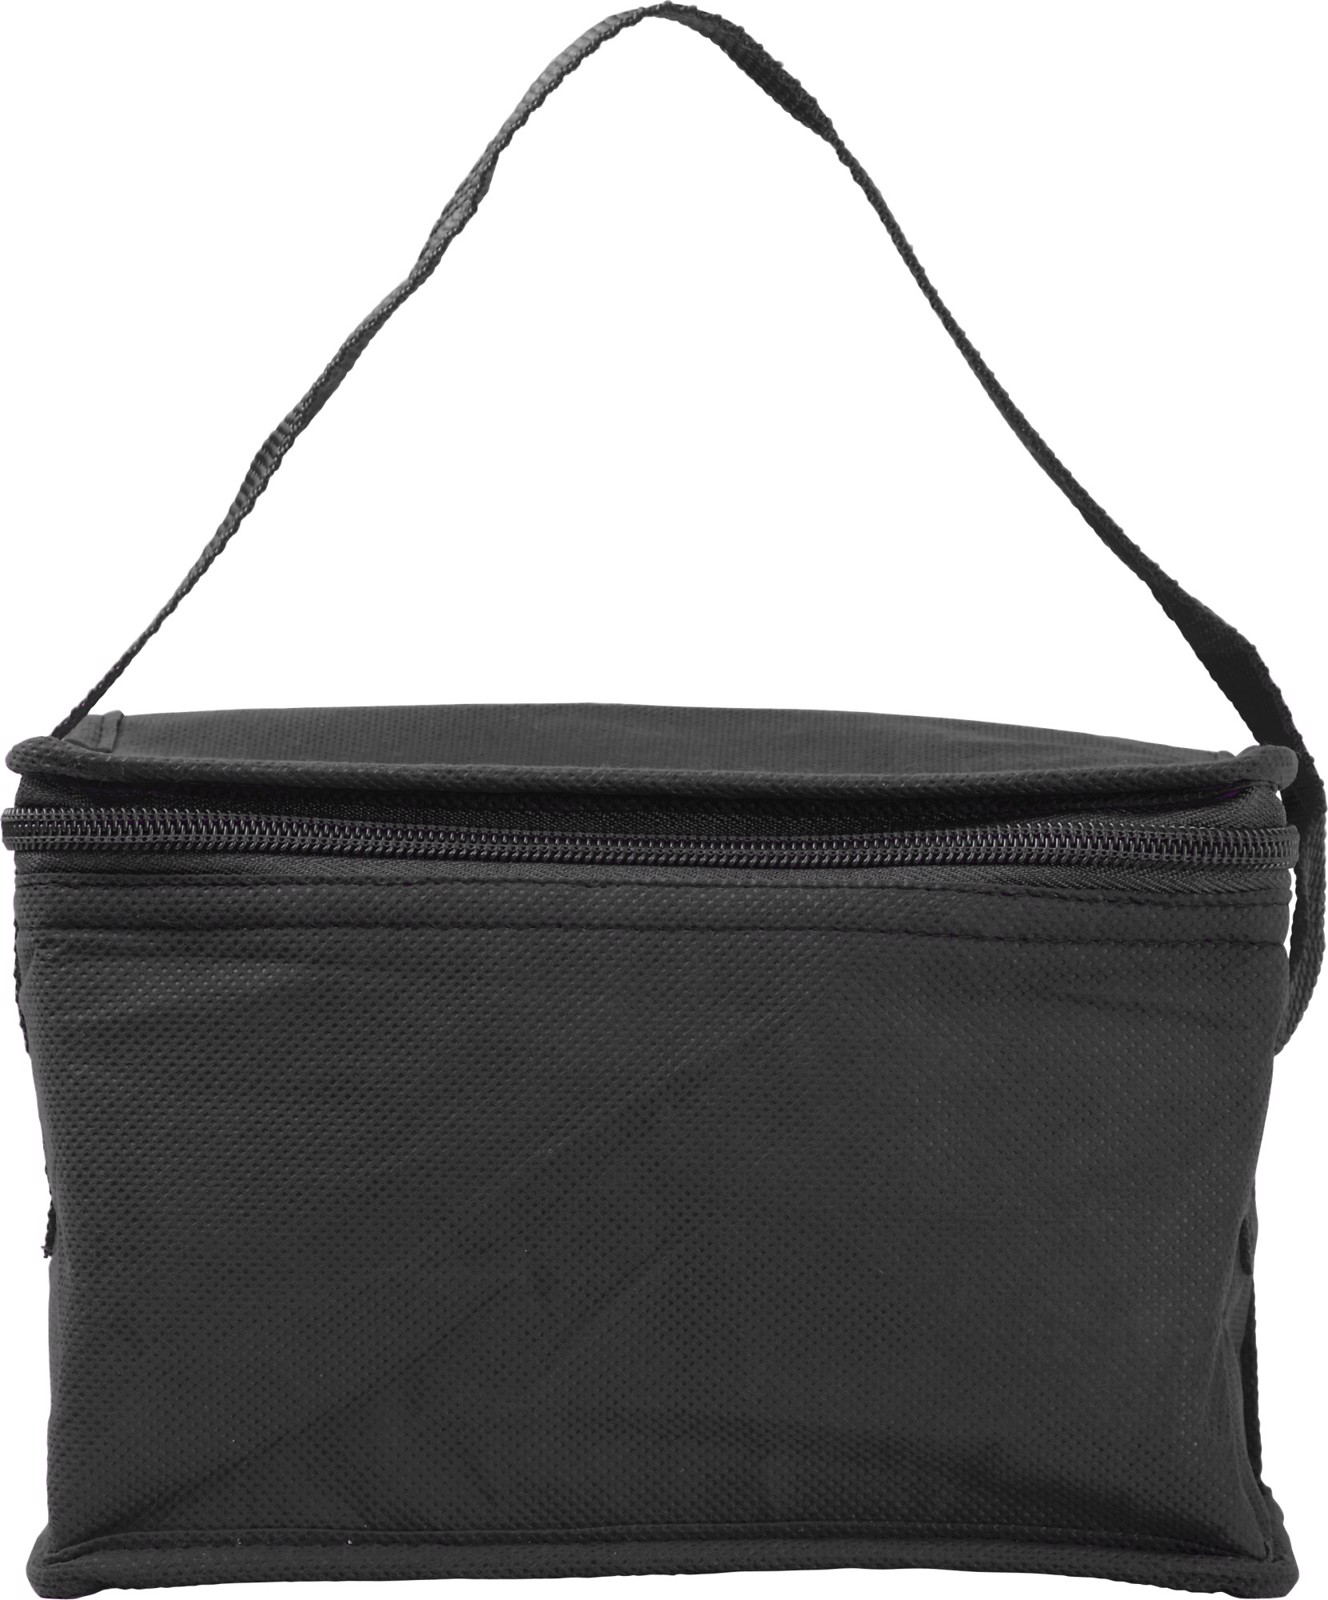 Nonwoven (80 gr/m²) cooler bag - Black